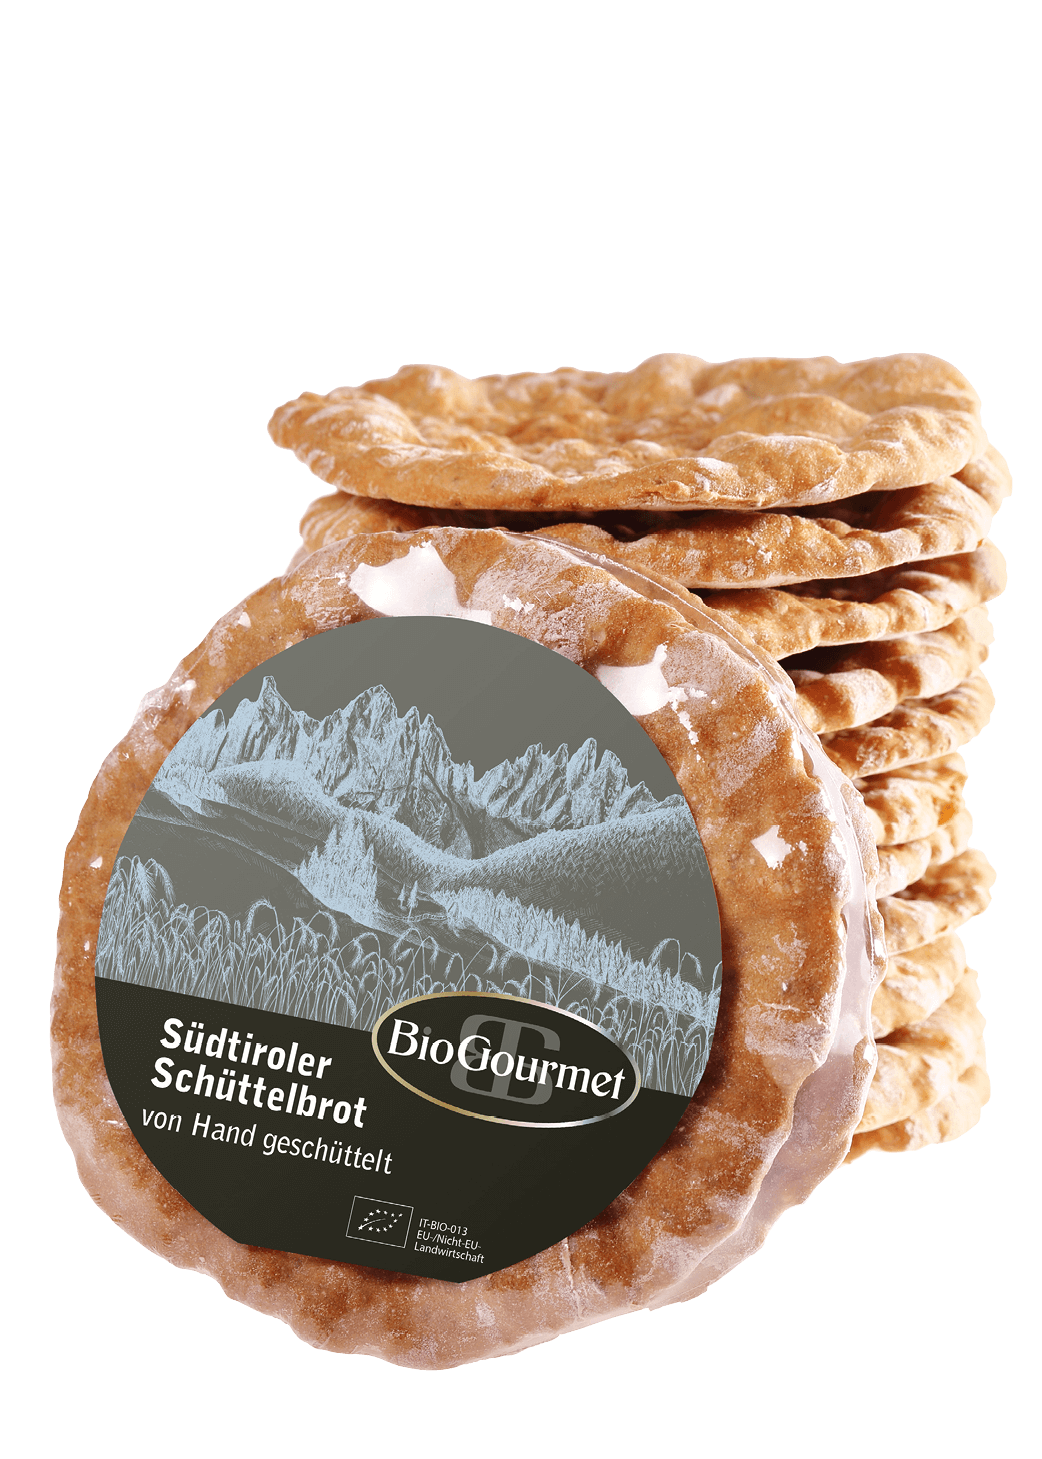 Südtiroler Schüttelbrot